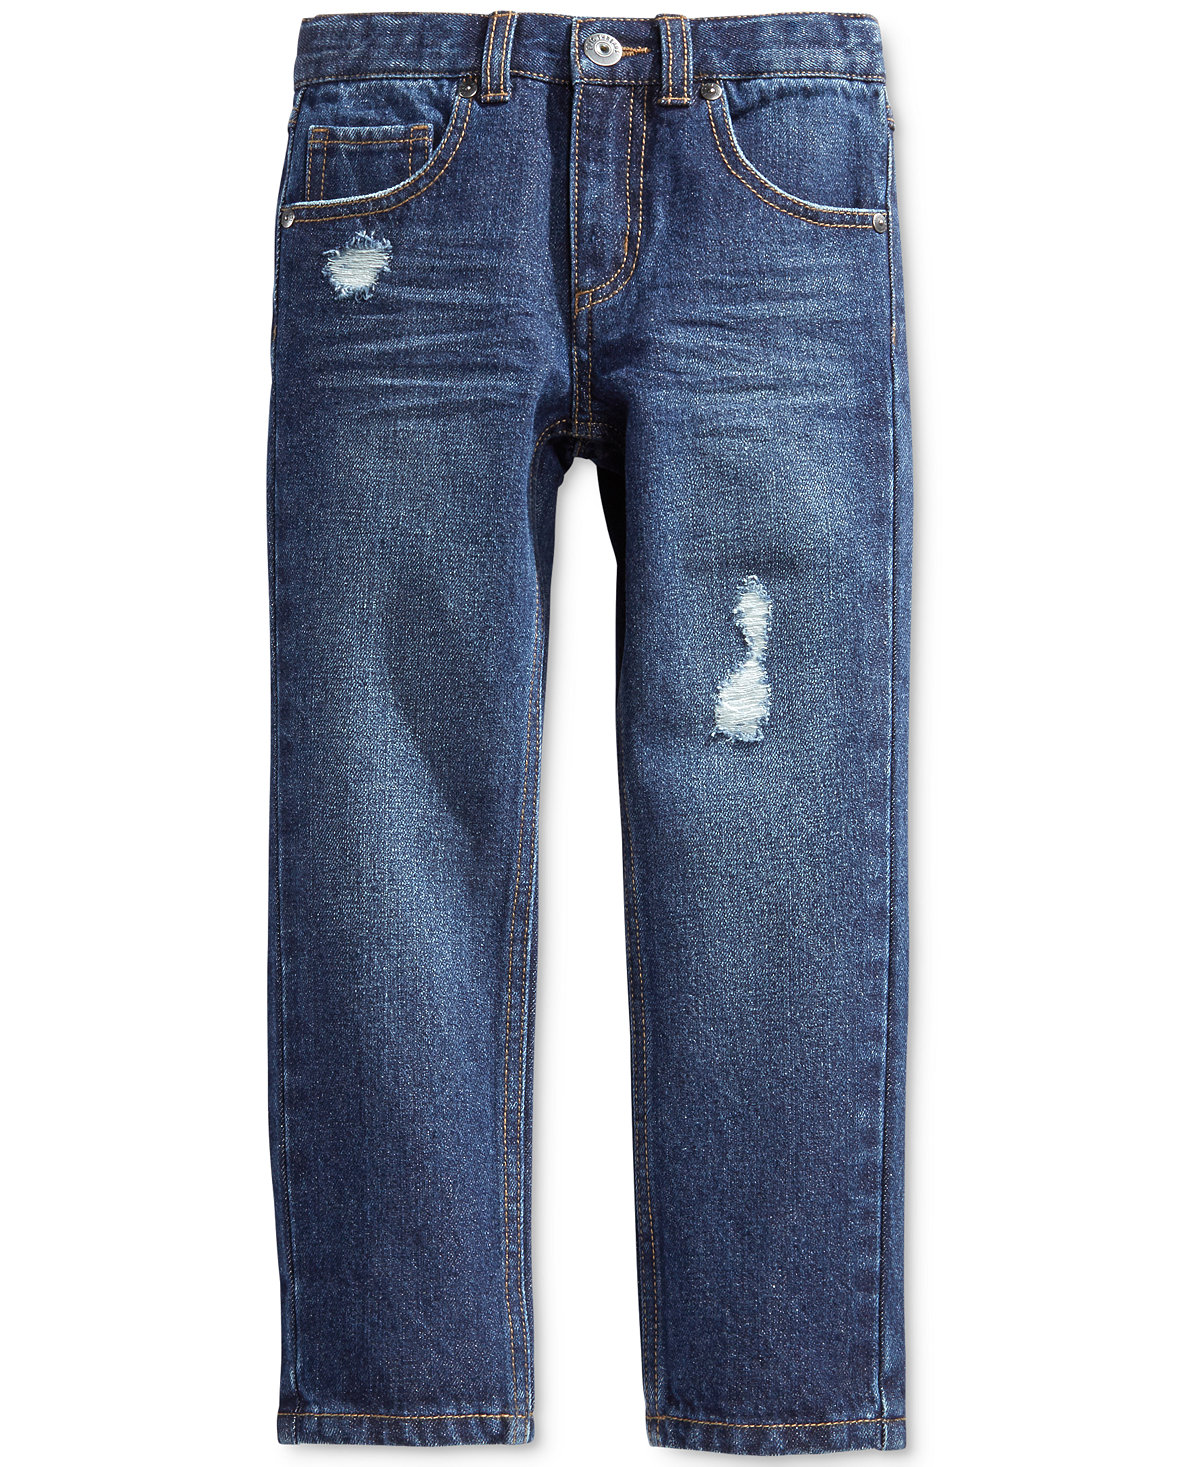 epic-threads-jeans-macys.jpg